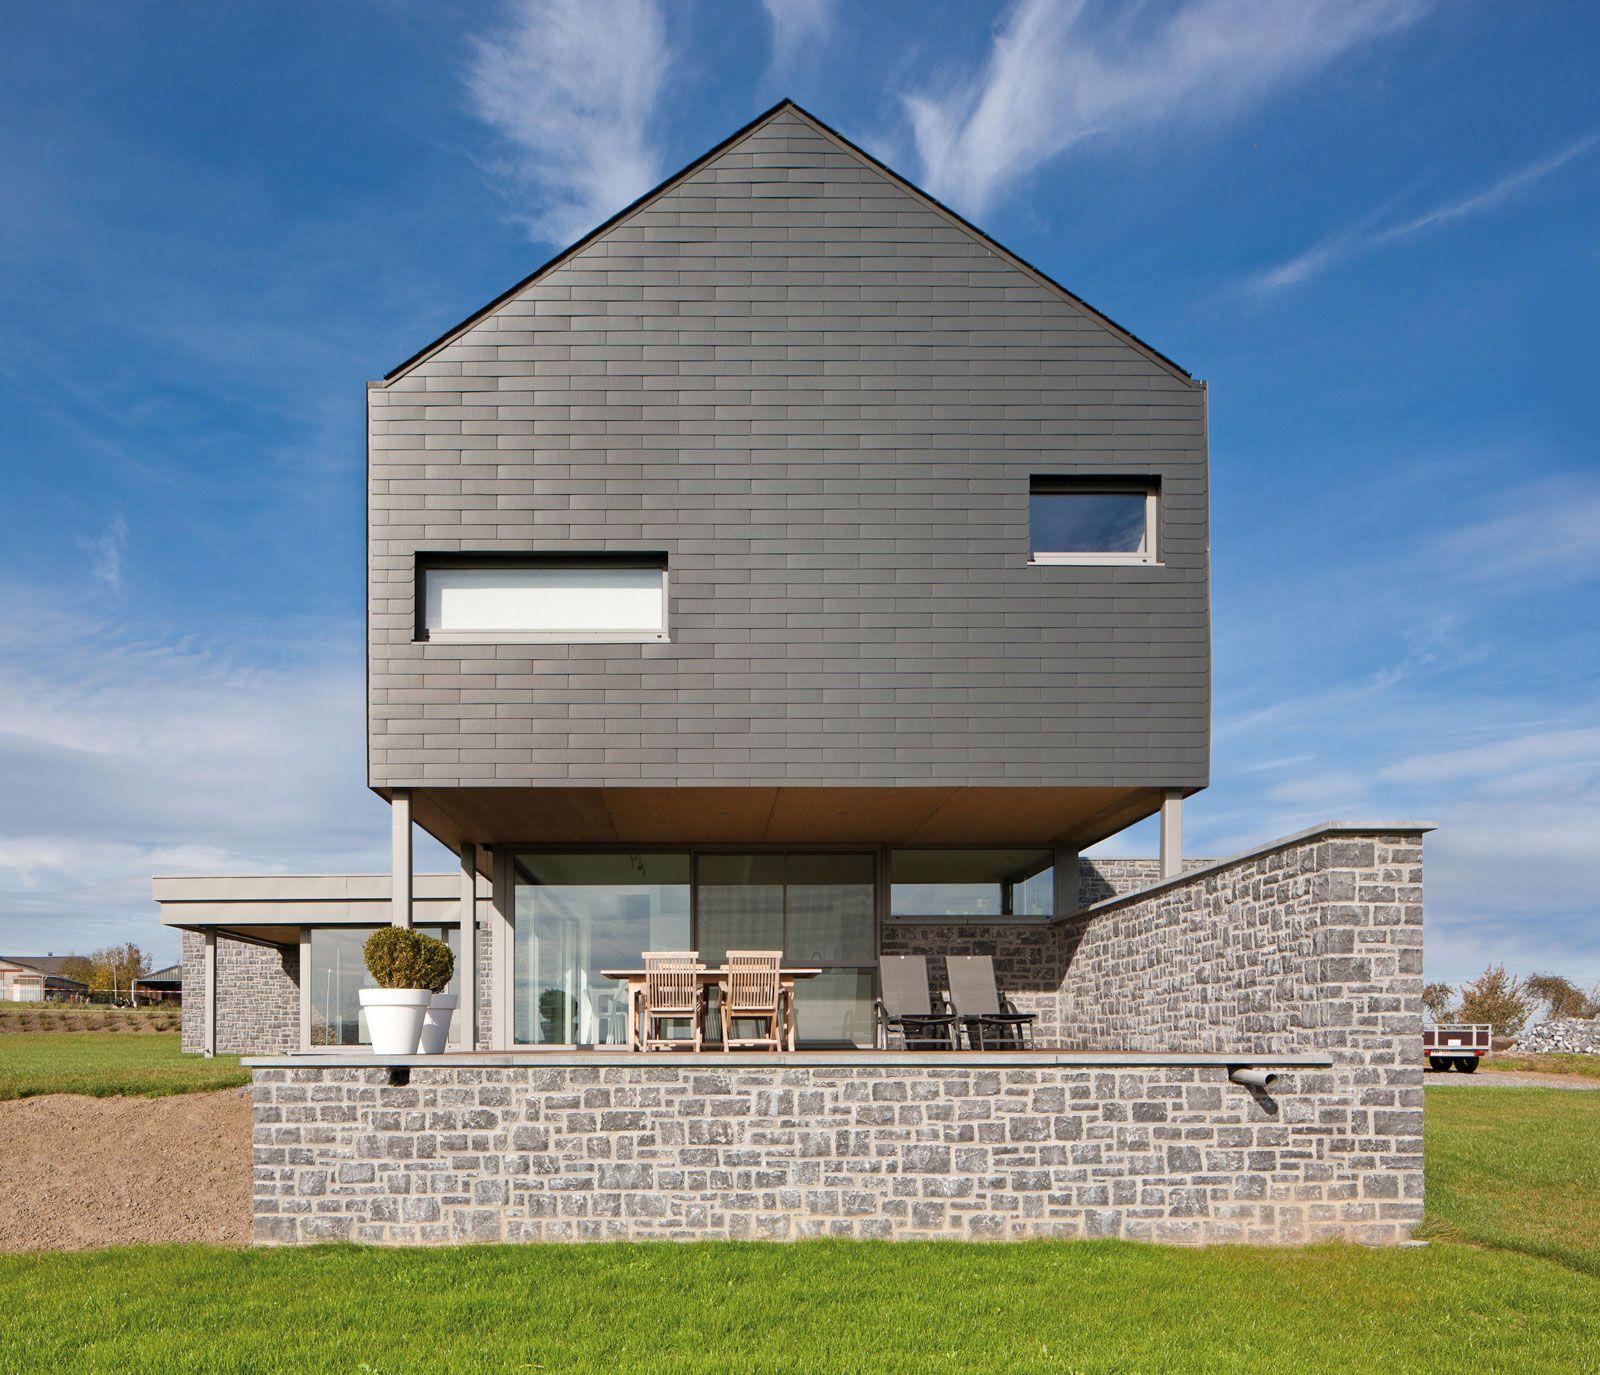 marley eternit natura fibre cement cladding residential. Black Bedroom Furniture Sets. Home Design Ideas